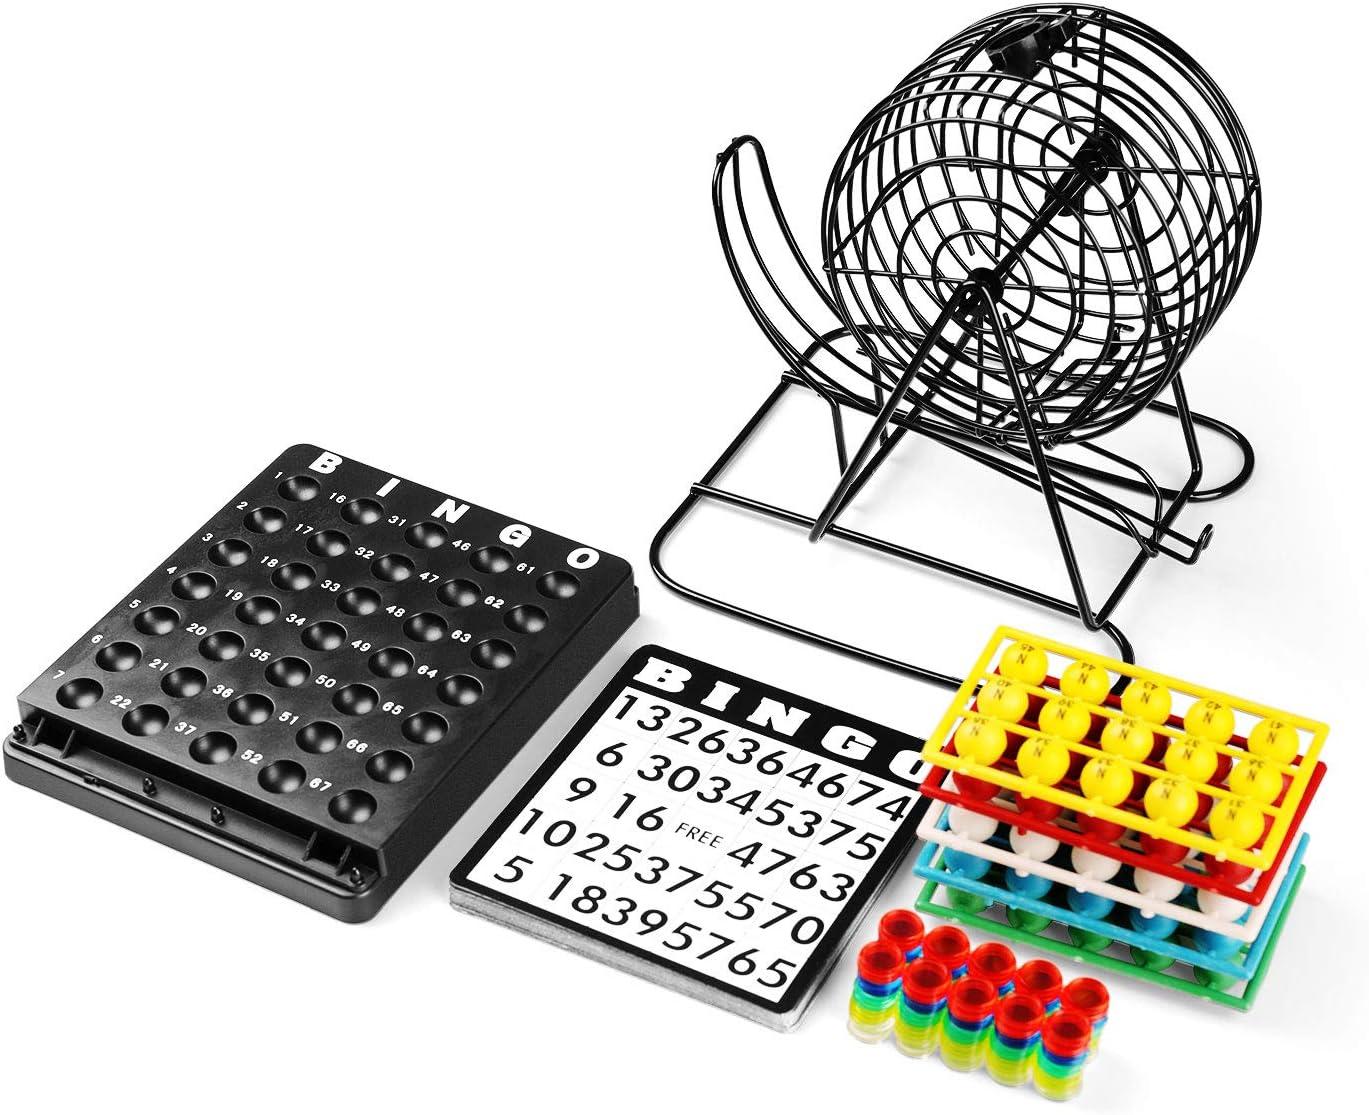 Bingofun Bingo Game Set with 8 Inch Metal Cage,75 Colored Balls with Plastic Masterboard,18 Bingo Cards,150 Bingo Chips for Fun